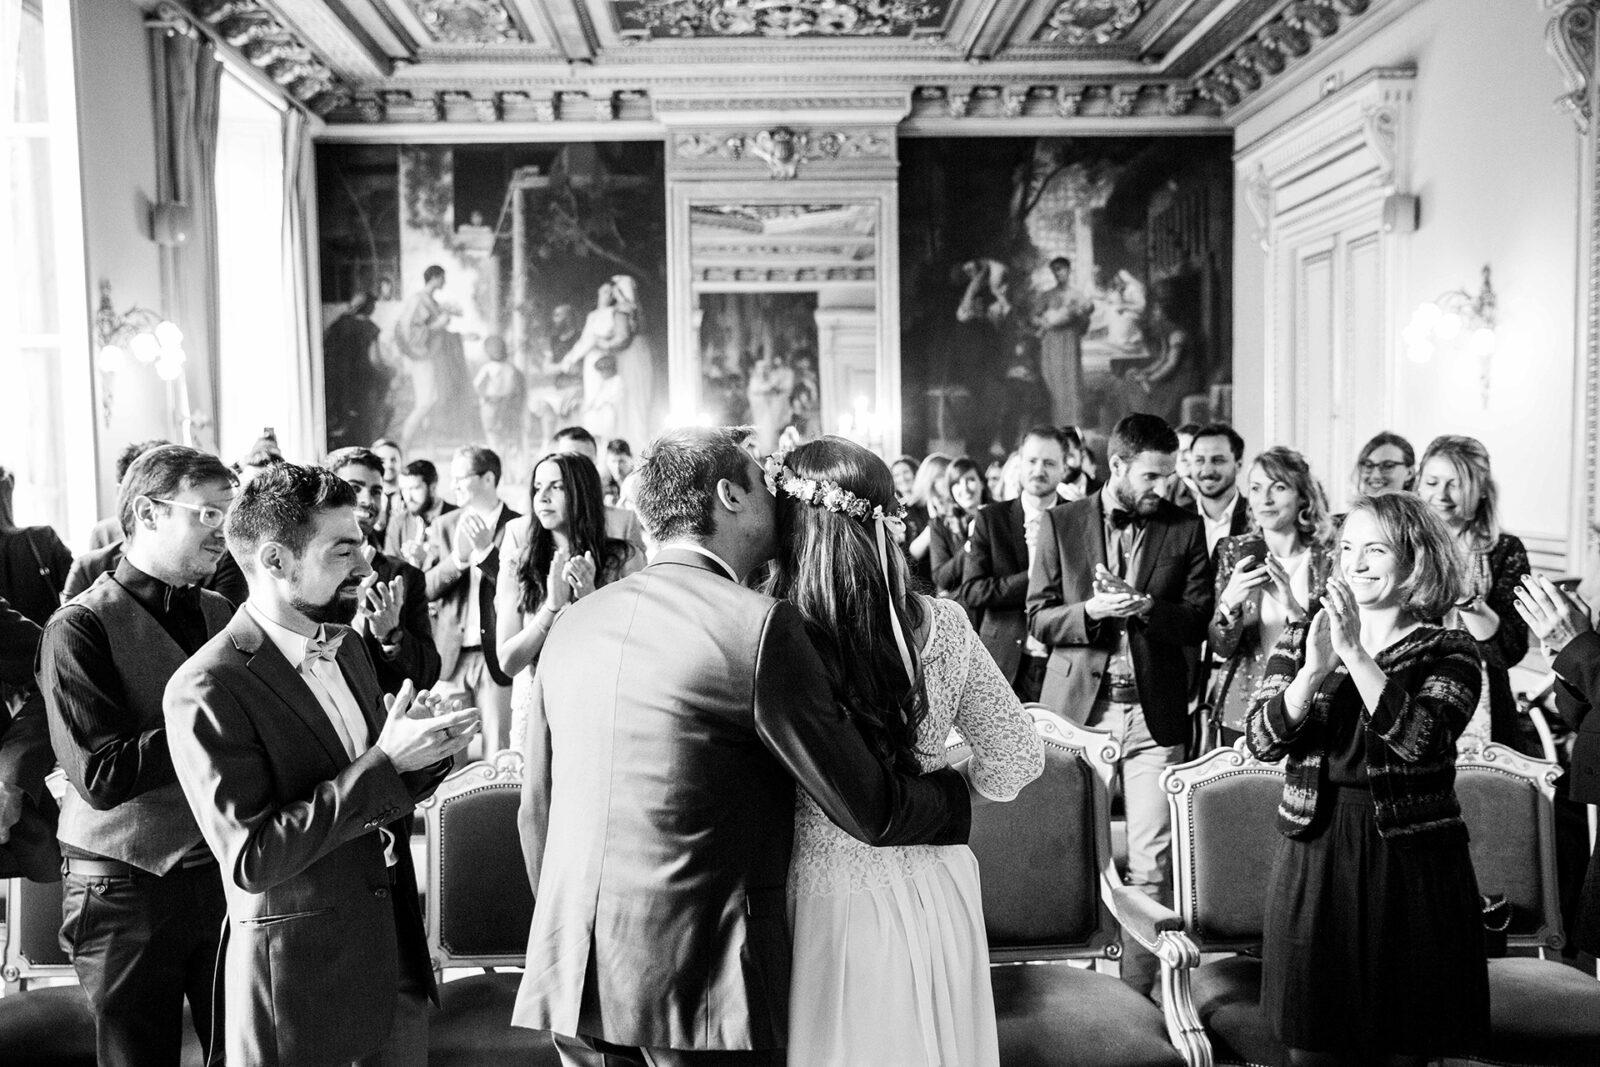 Caroline Bleux Photographe Mariage Grossesse Famille Fête anniversaire Caroline Bleux Photographe